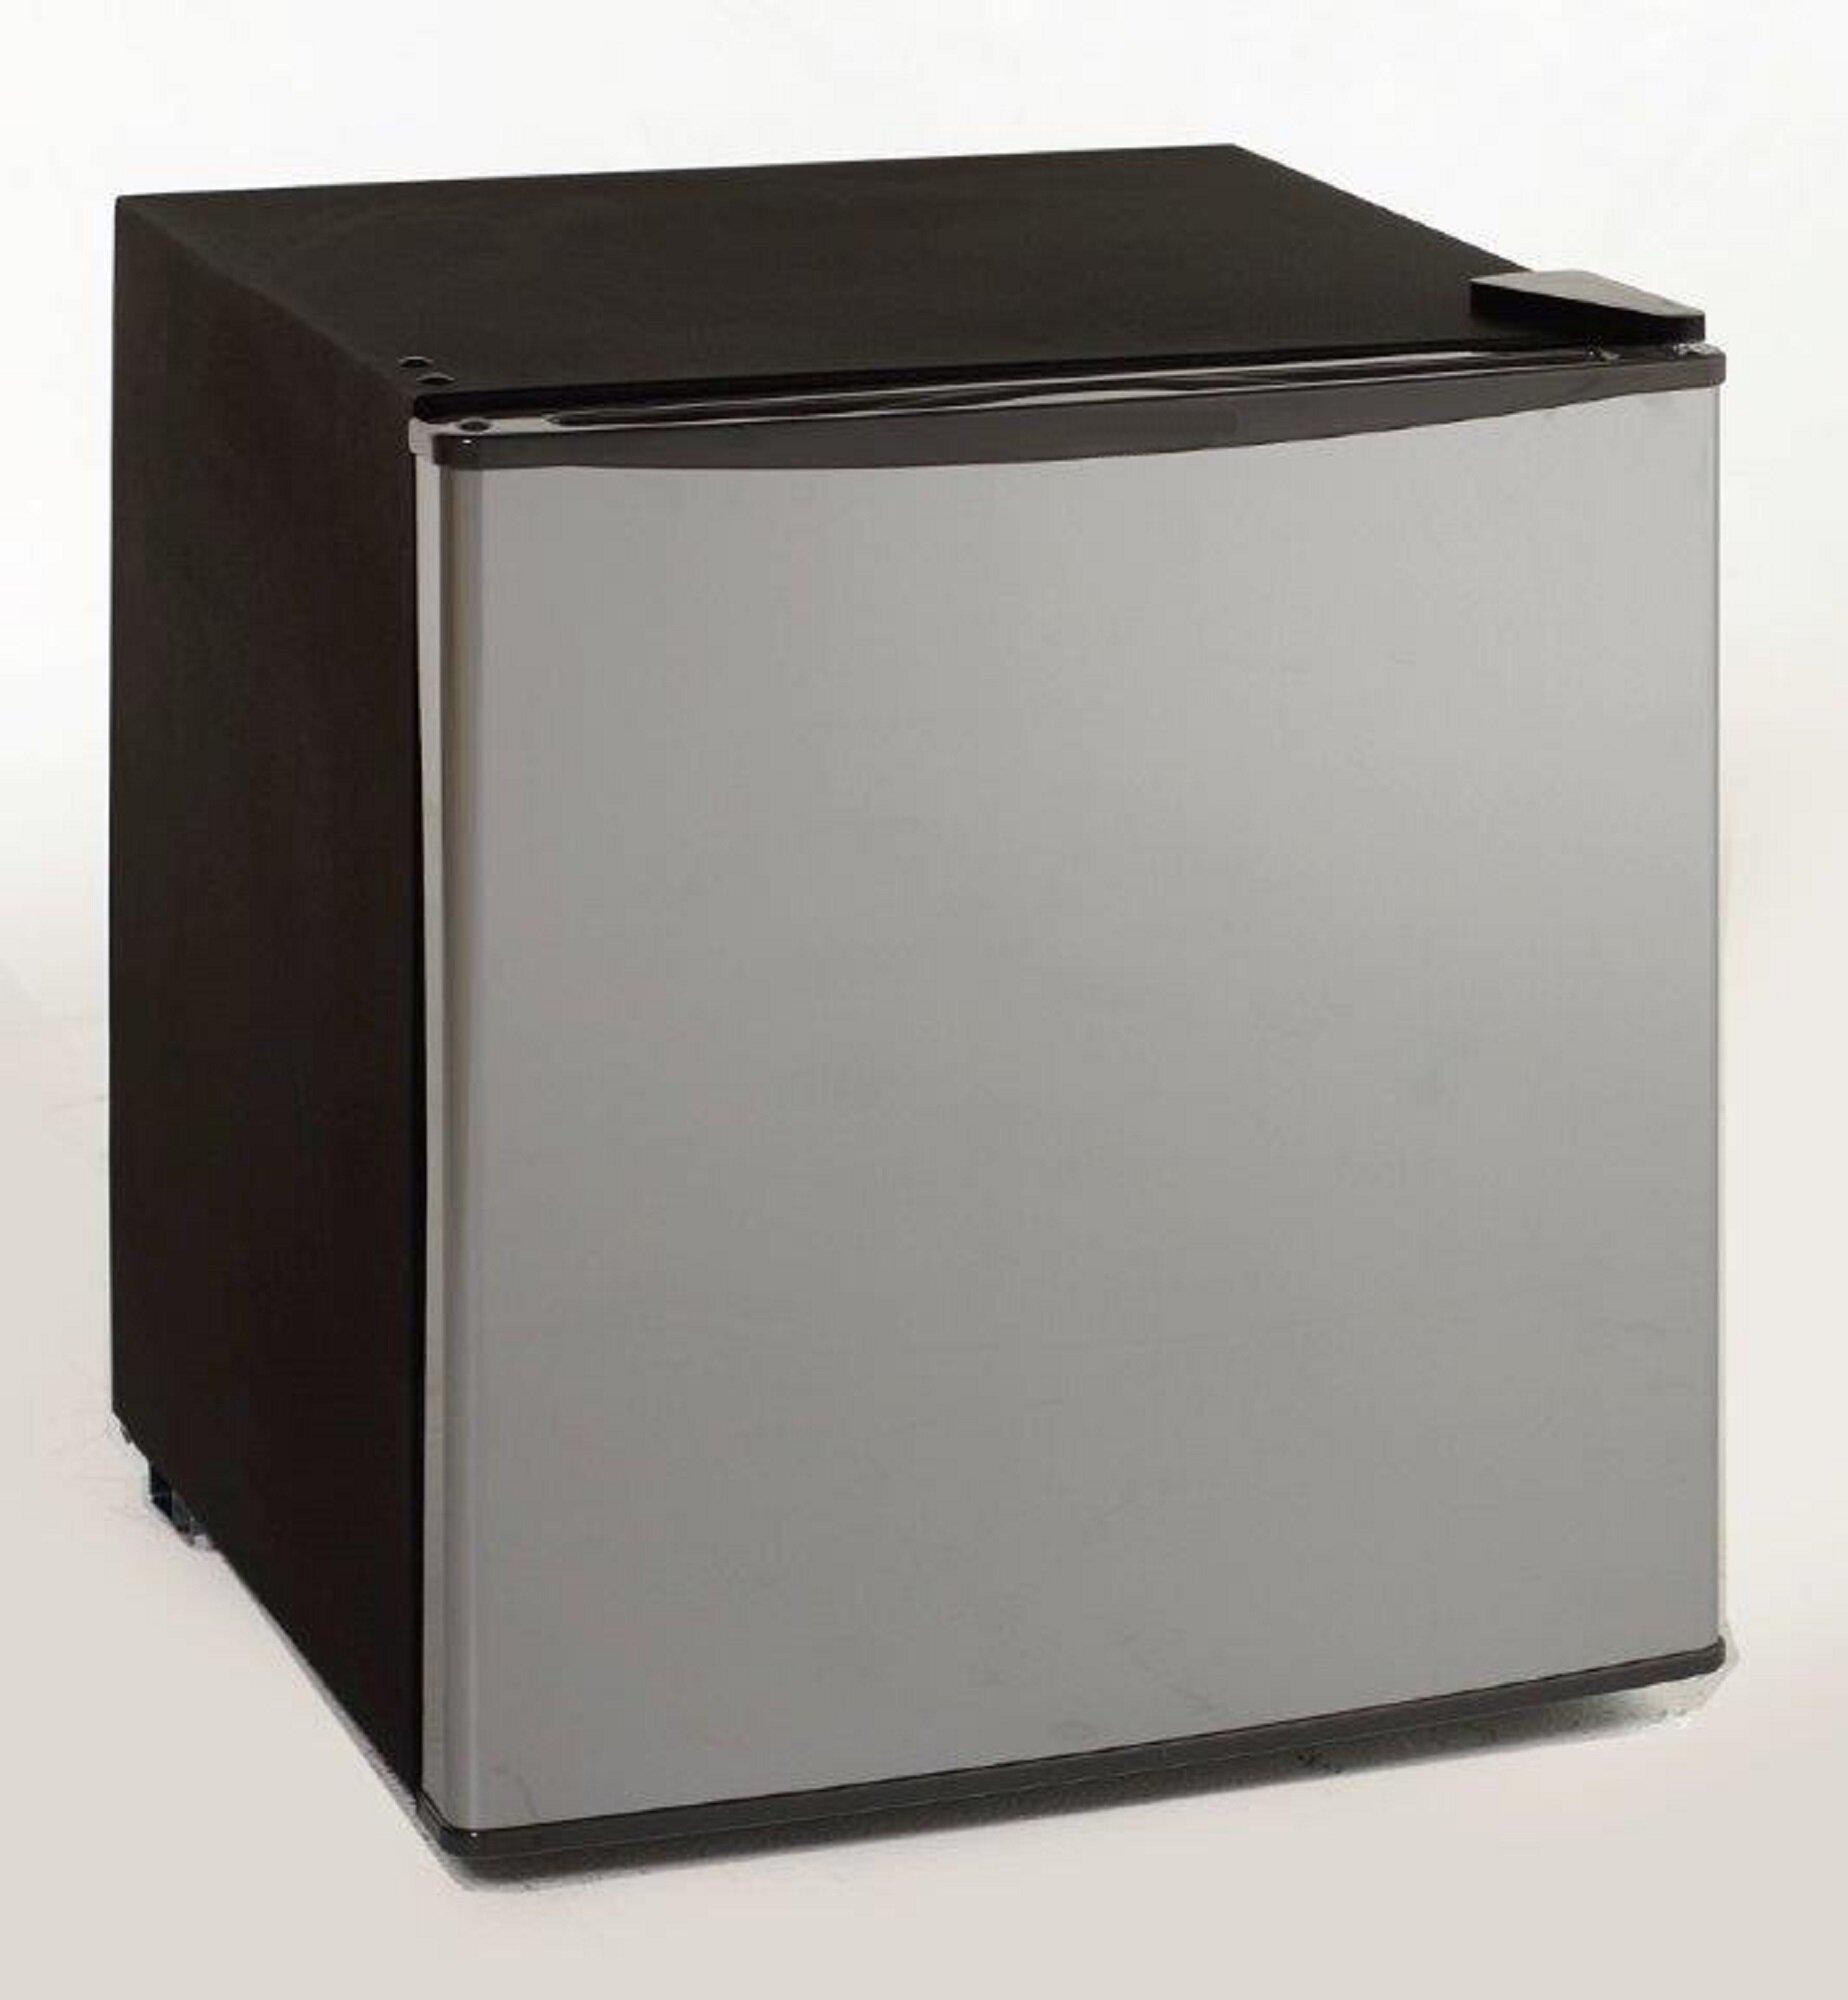 1 7 Cu Ft Freestanding Mini Fridge